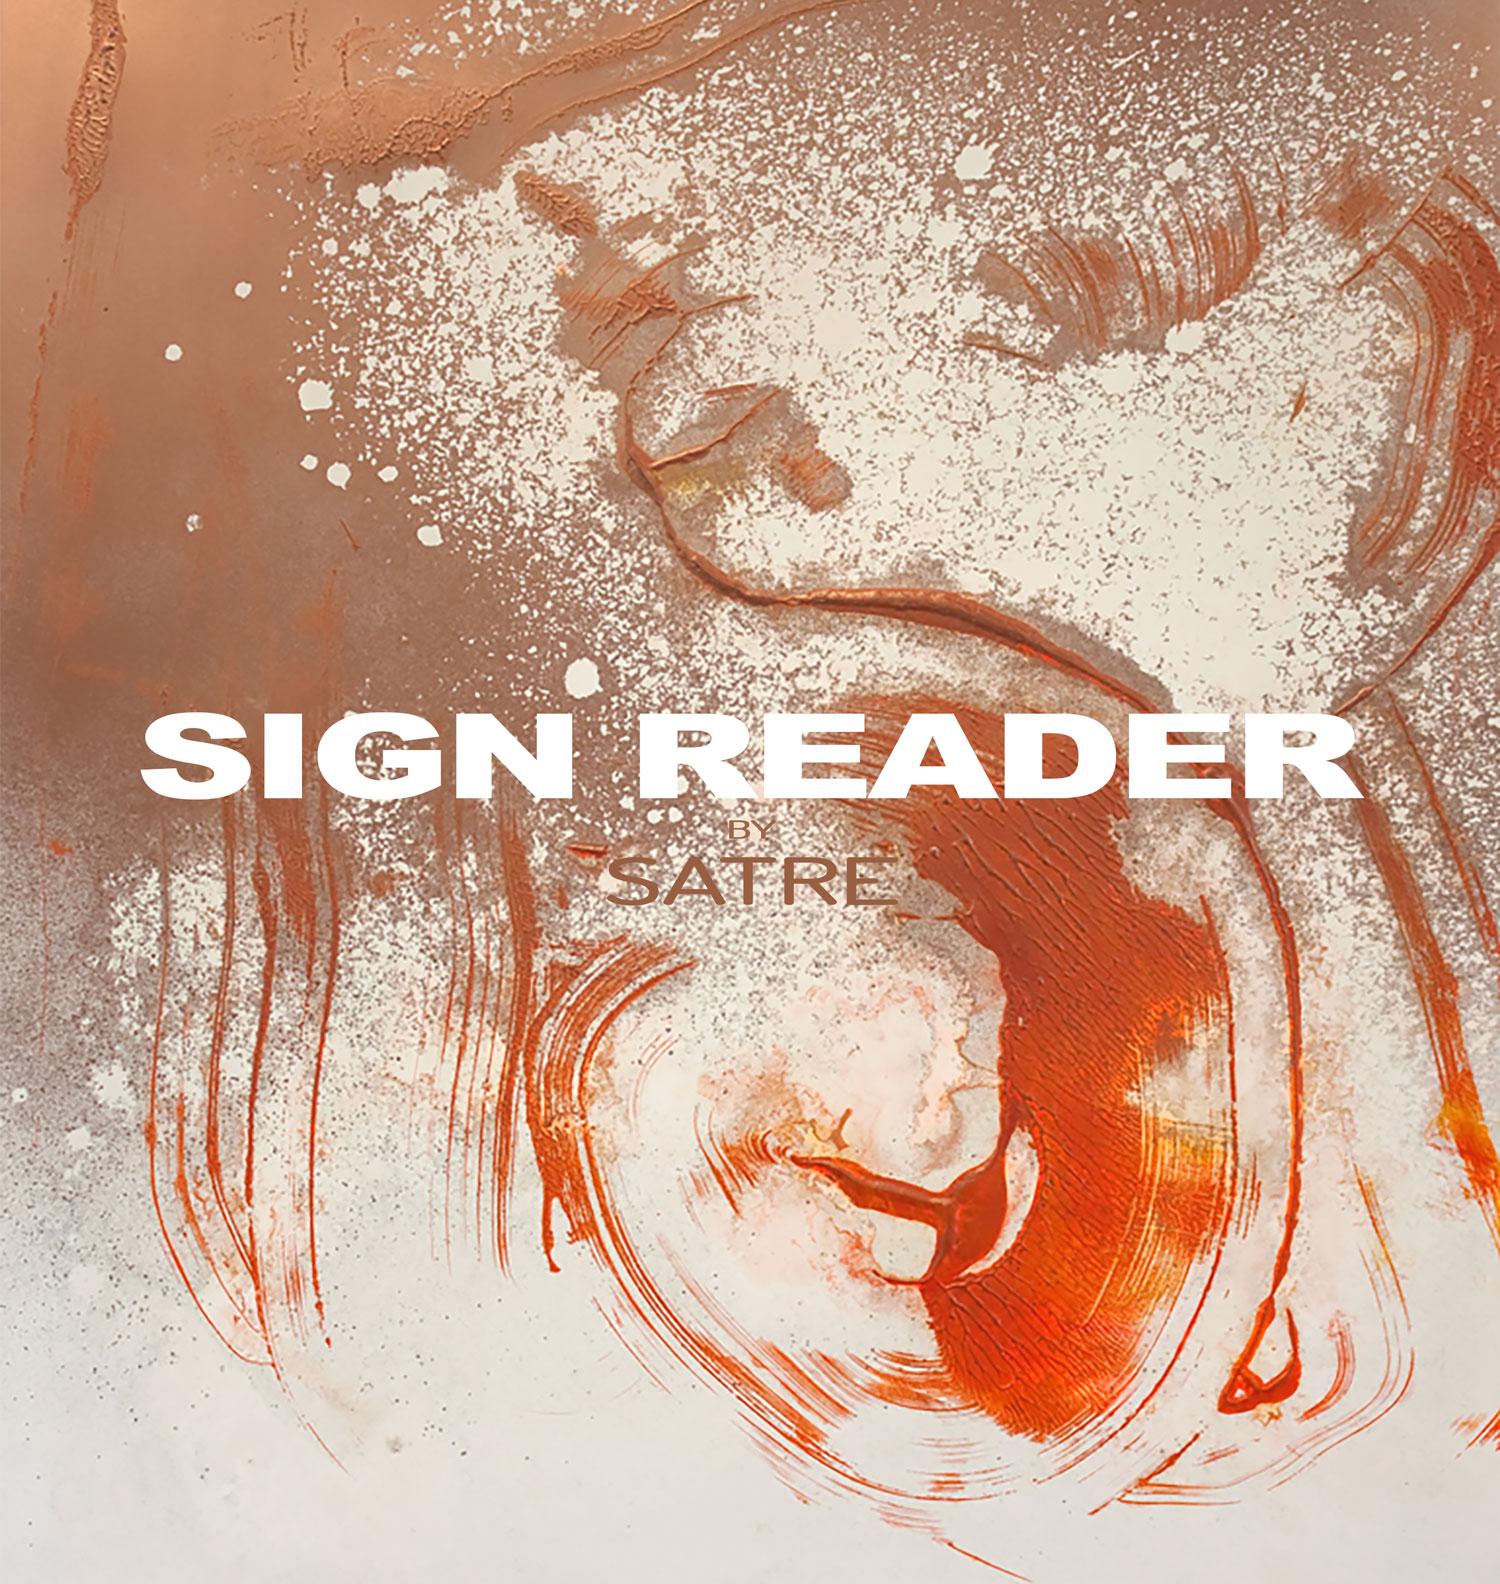 Sign-reader-front-geir-satre-1500.jpg